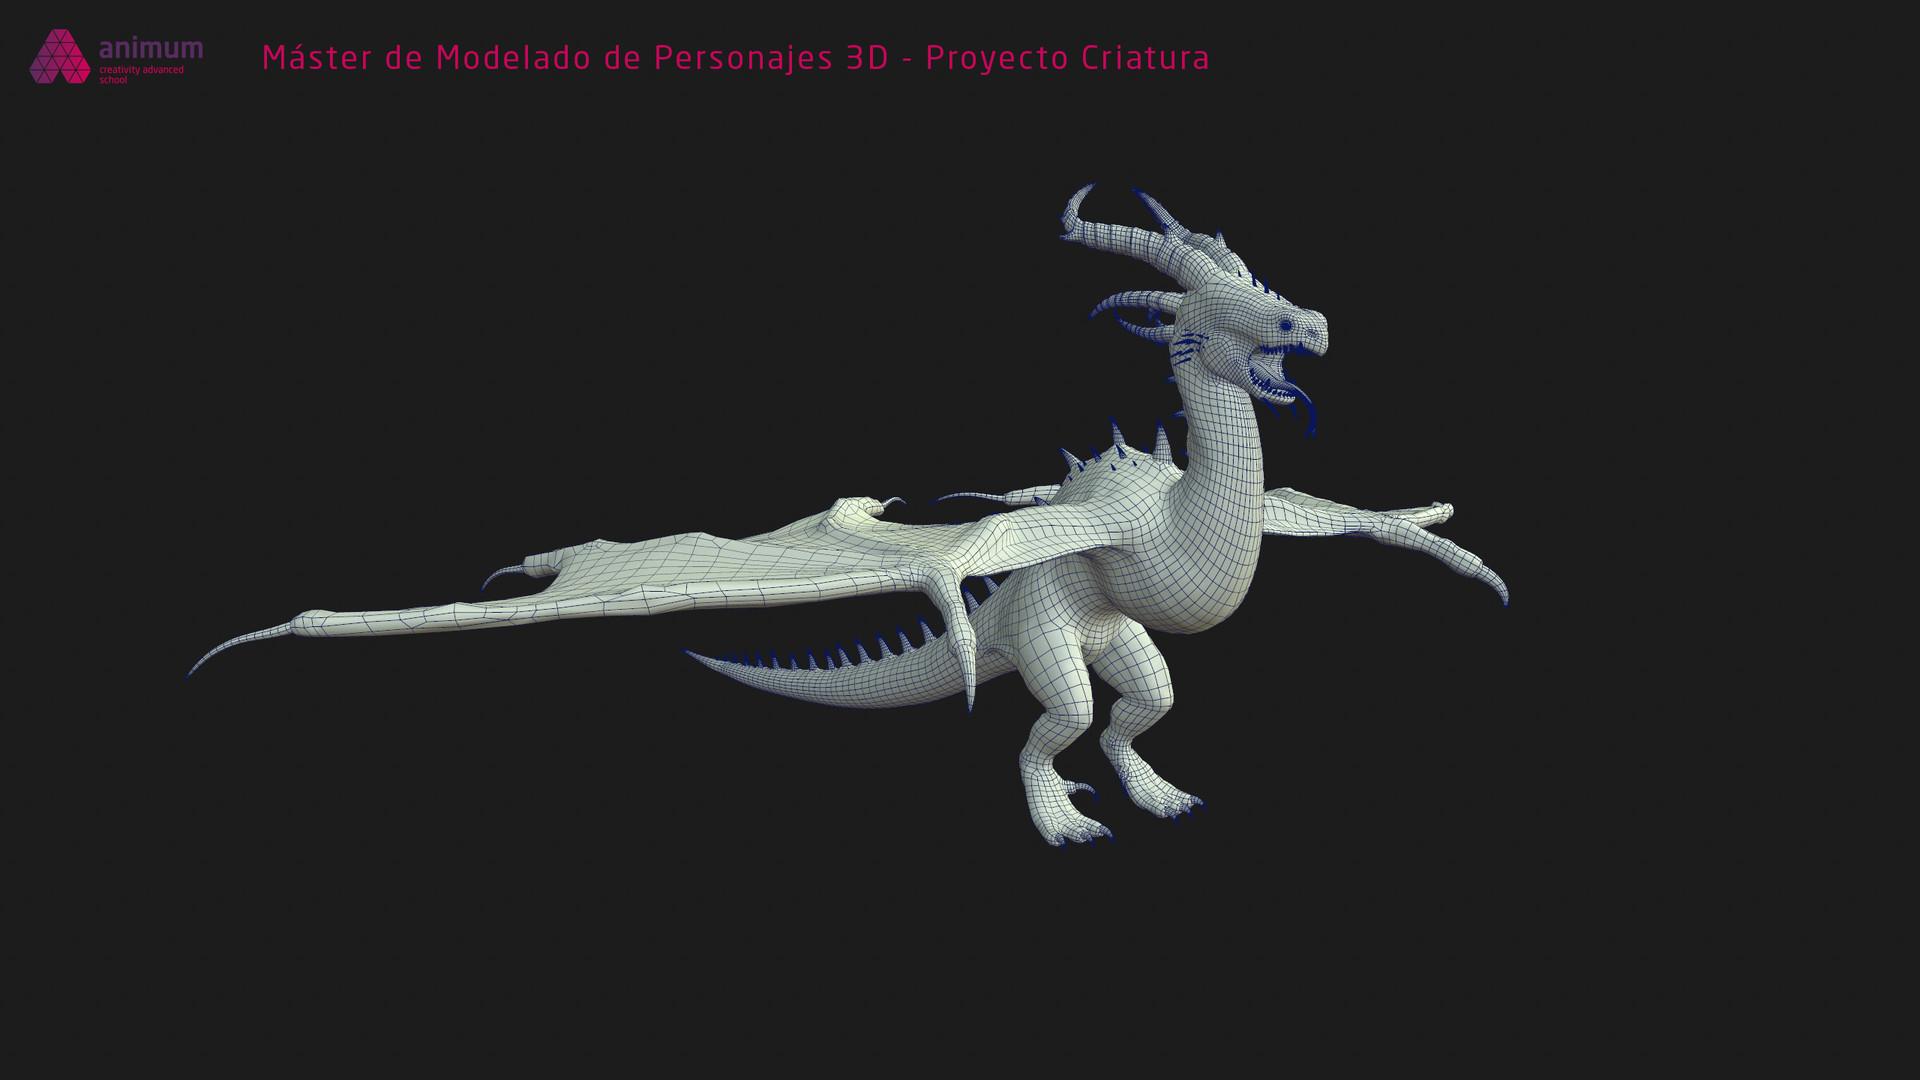 Miquel purra modelado 3d criatura miquel purra front wire